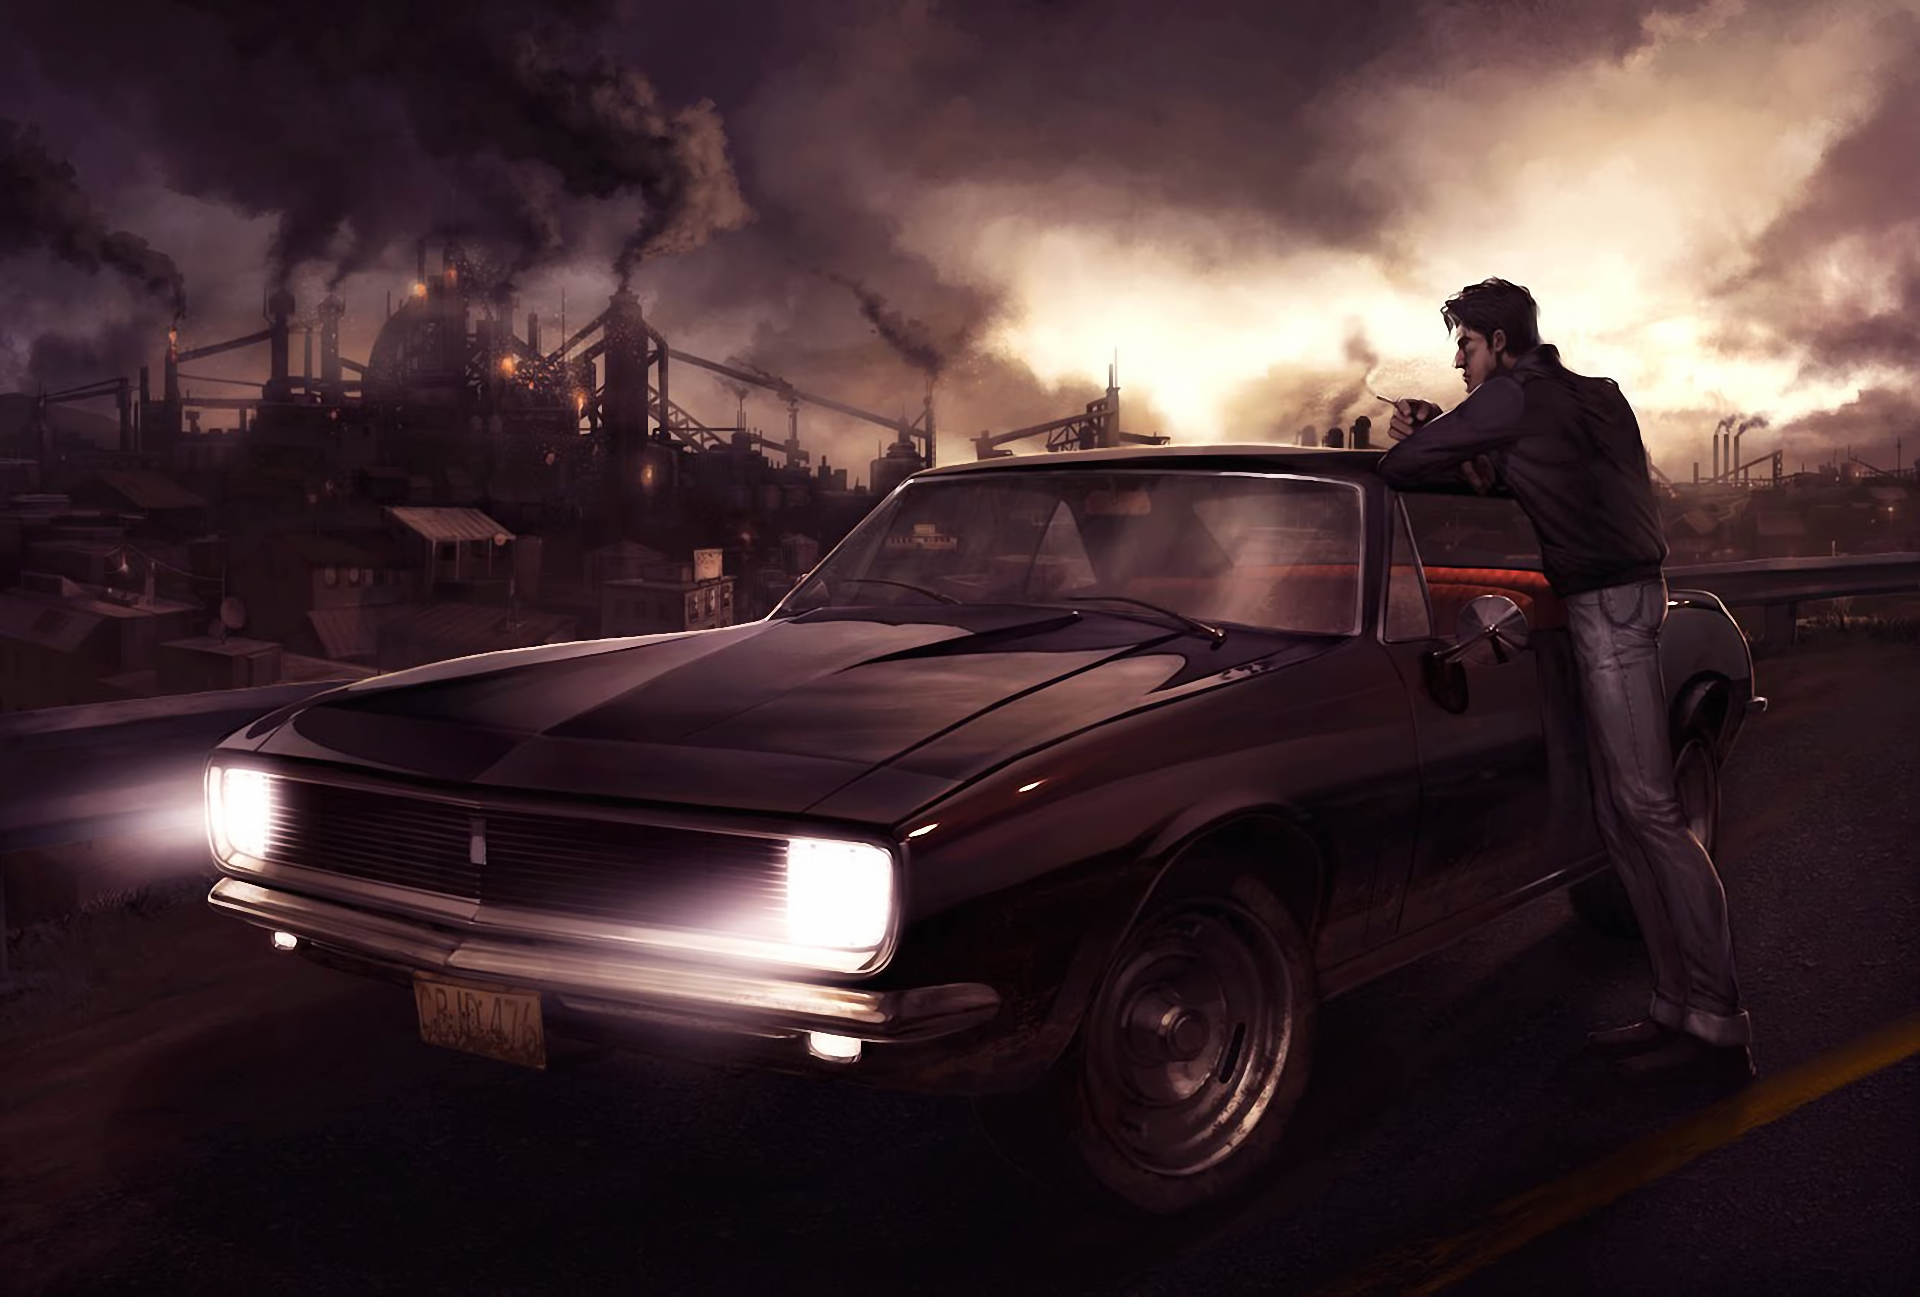 Background Car Hd Wallpapers Cities: Drake Metal City HD Wallpaper